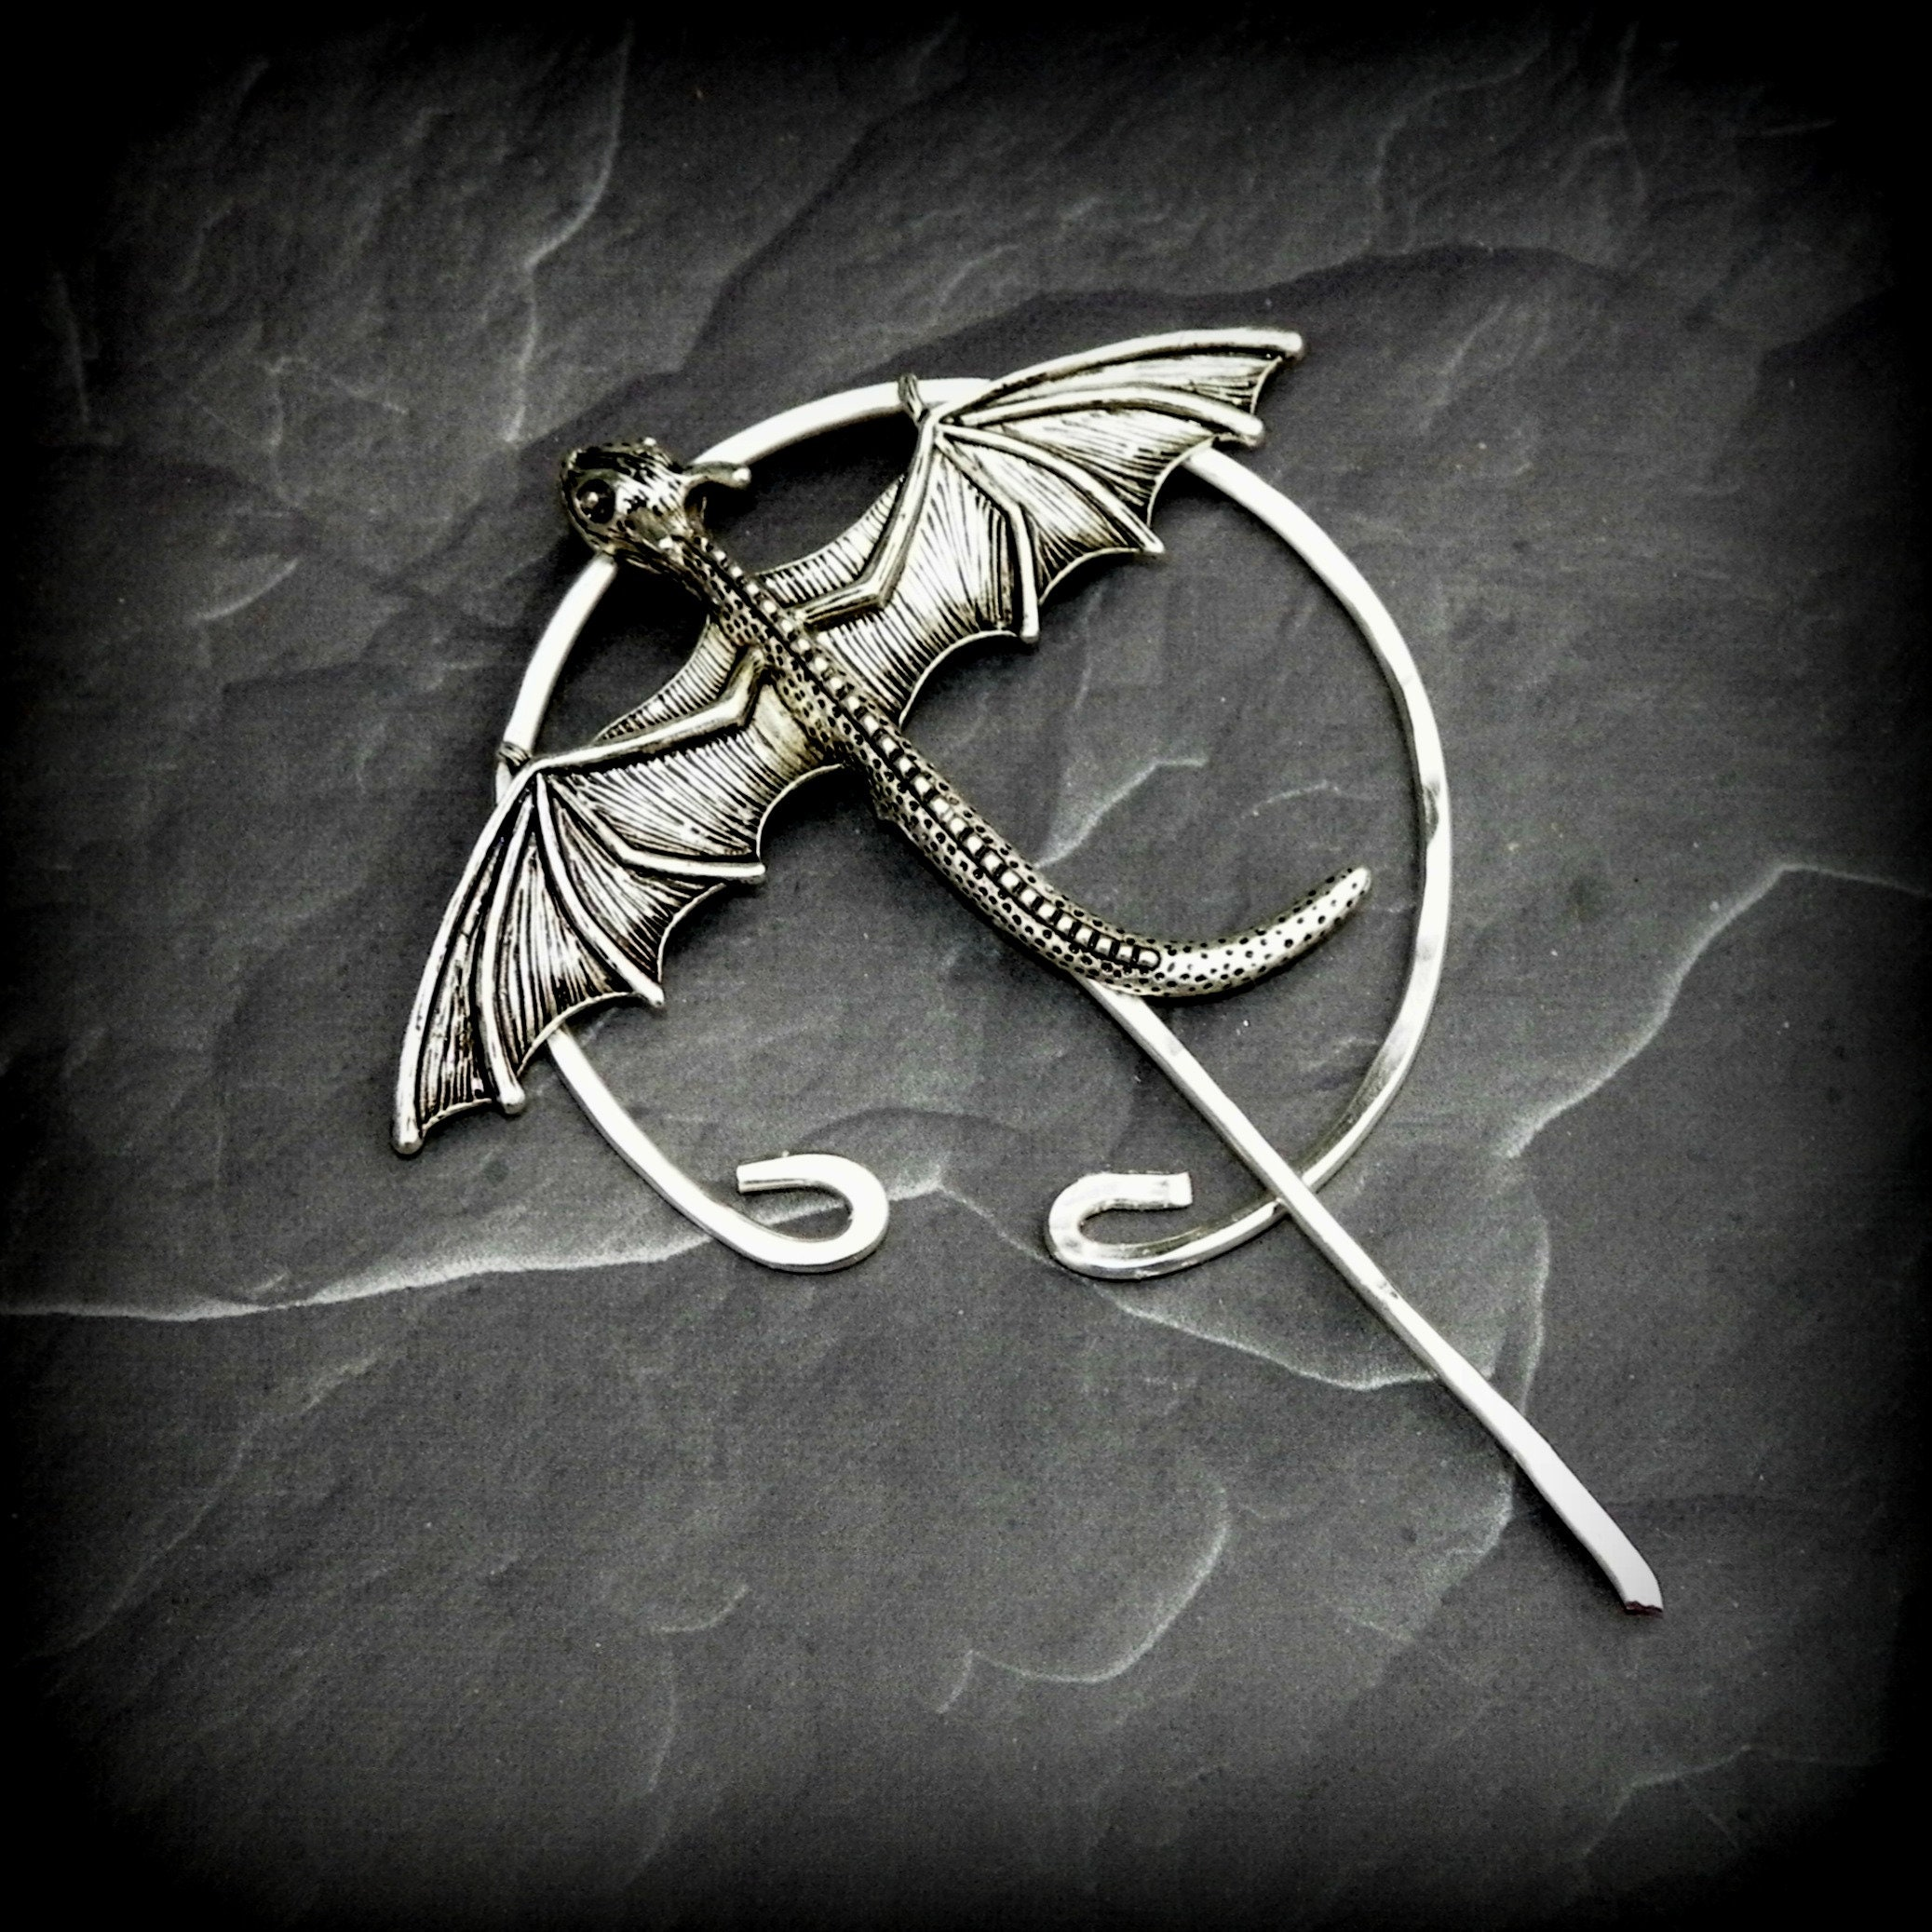 Silver,Shawl,Pin,Dragon,Viking,Penannular,Circle,Mimimalistic,Brooch,Vintage,Hammered,Minimalist,Outlander,Style,Scarf,Stick,Accessories,scarf_pin,shawl_pin,silver_shawl_pin,celtic_shawl_pin,outlander_pin,mimimalist_pin,Penannular_shawl_pin,miminmalistic_pin,viking_pin,outlander,brooch_pin,dragon_pin,daenerys